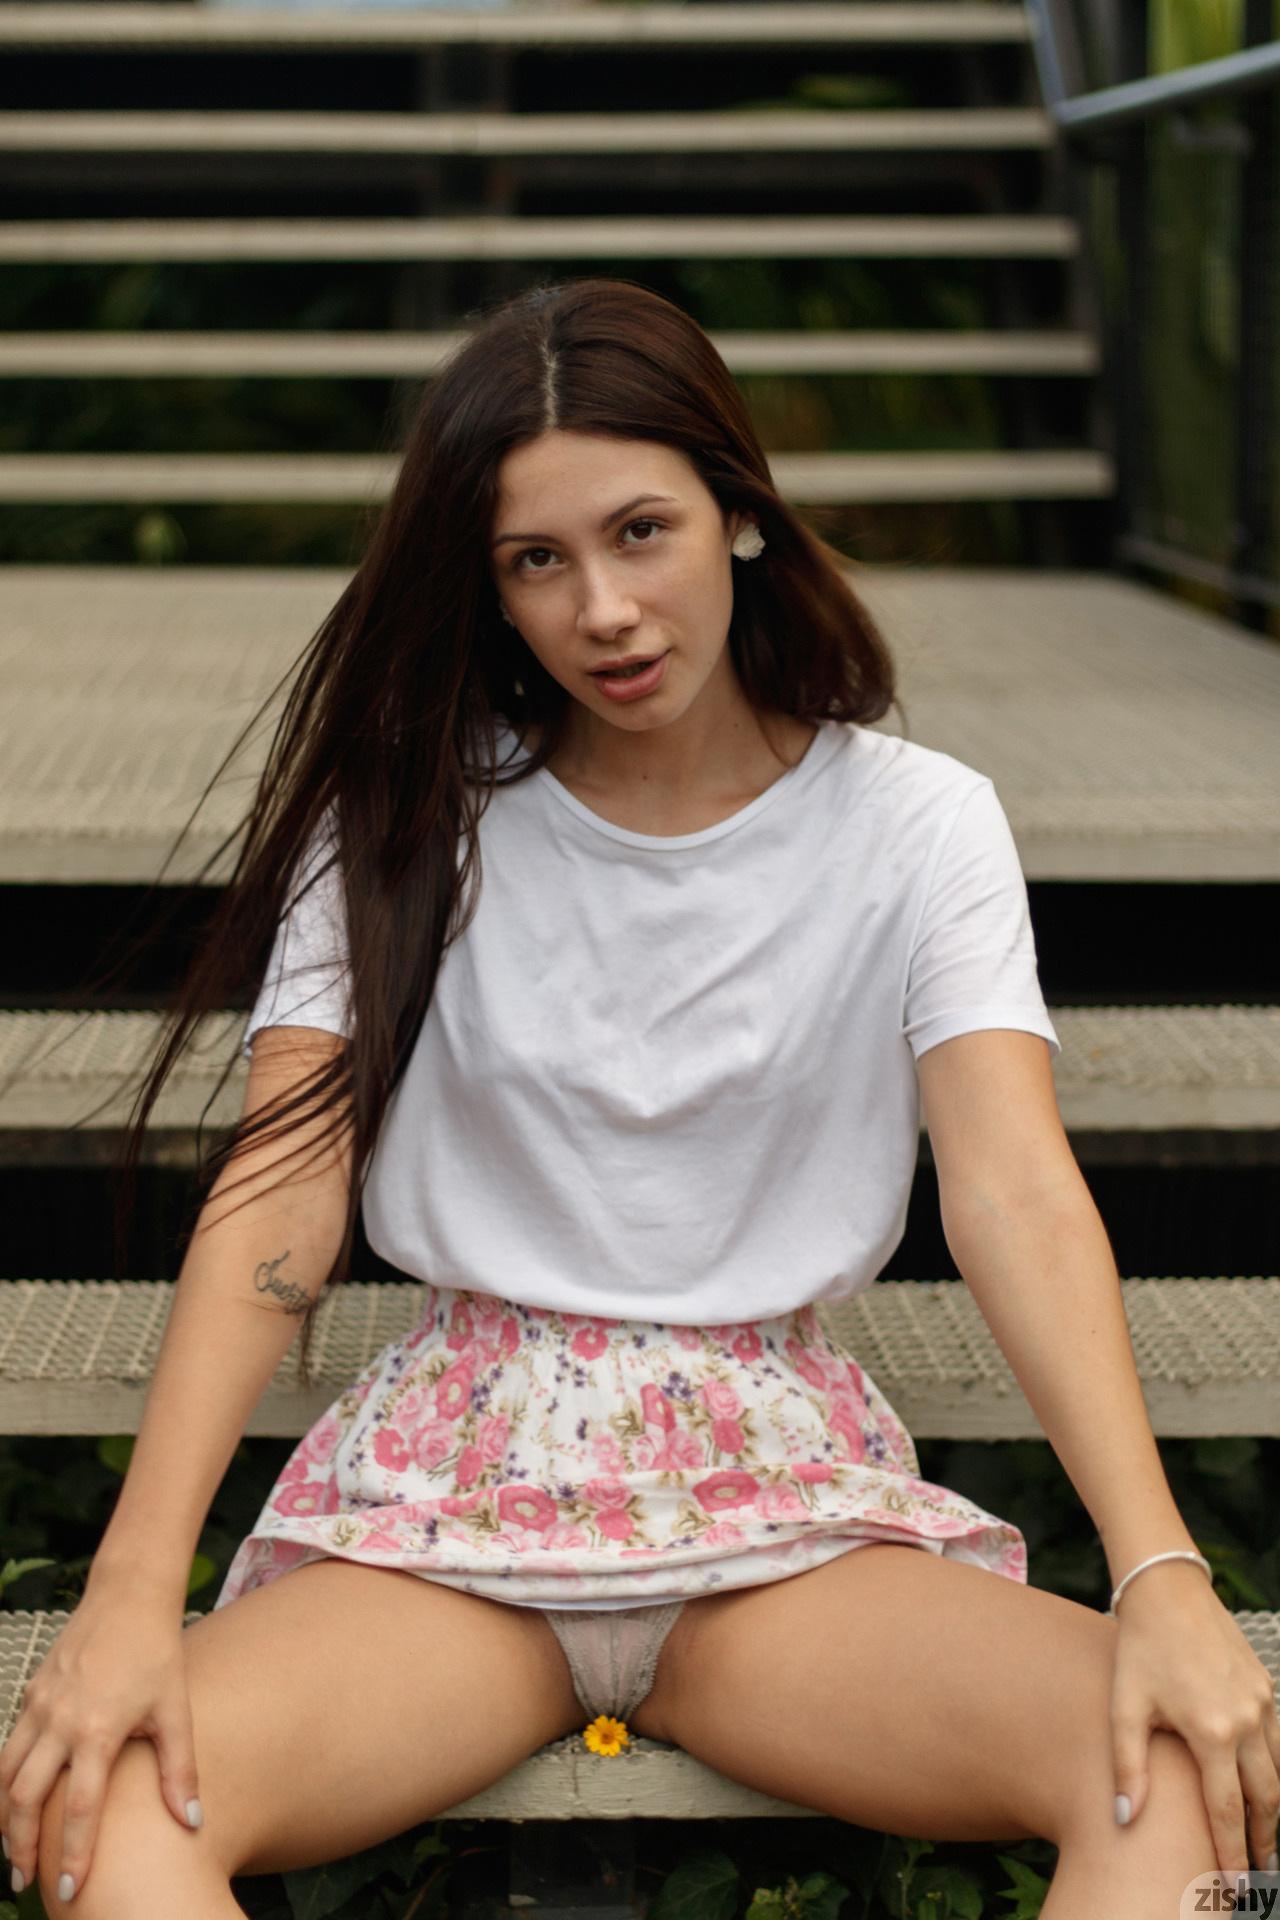 Paloma Andaquies Flores Colombianas Zishy (16)